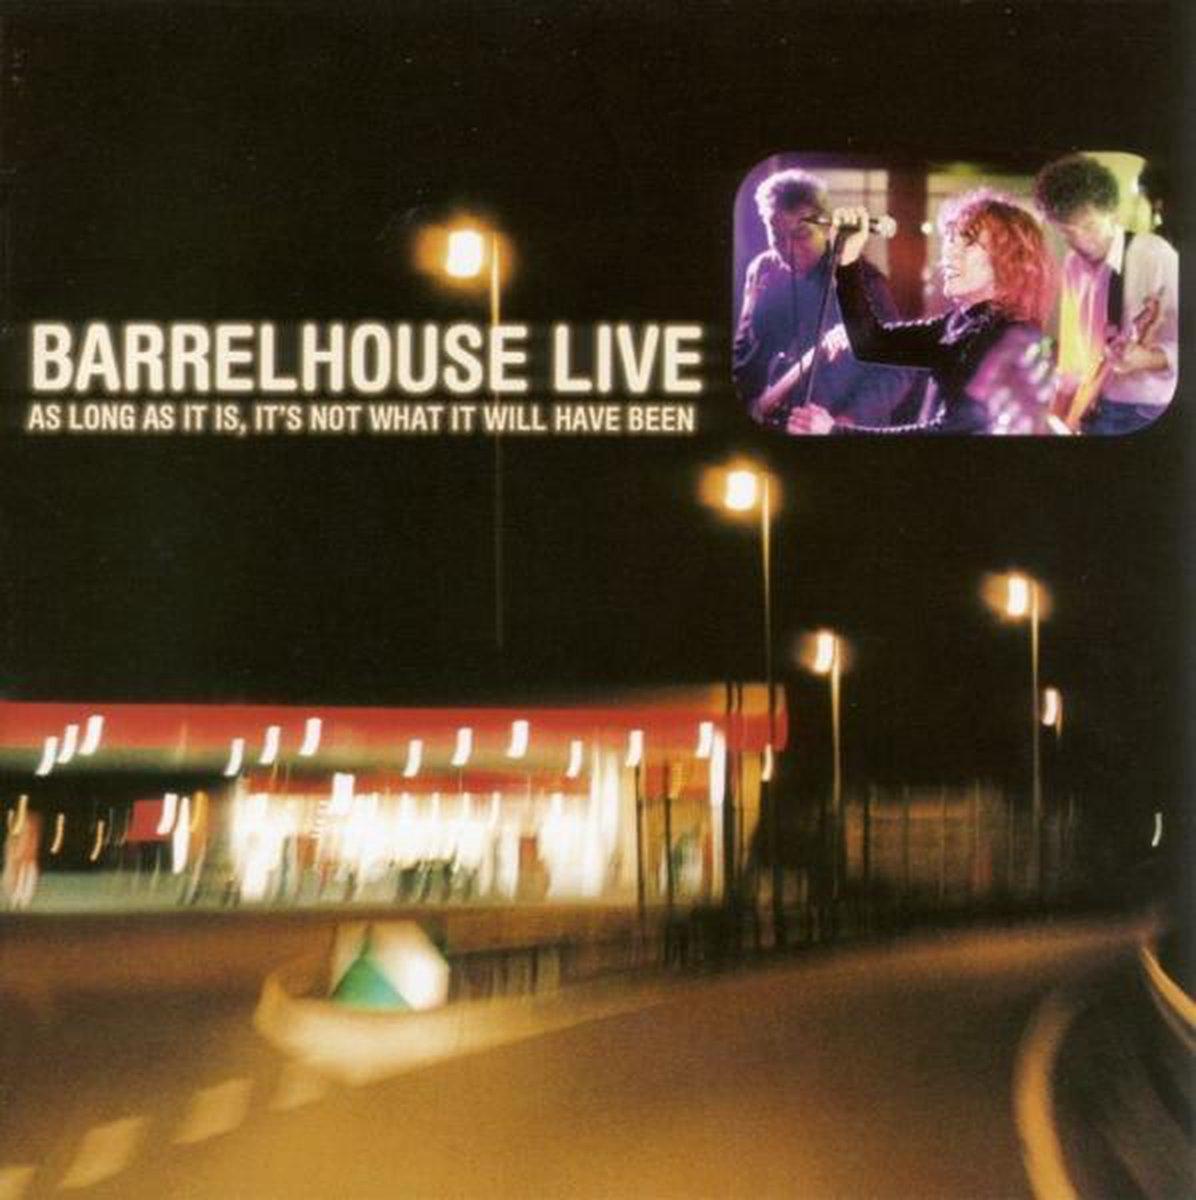 Live As Long As It Is - Barrelhouse